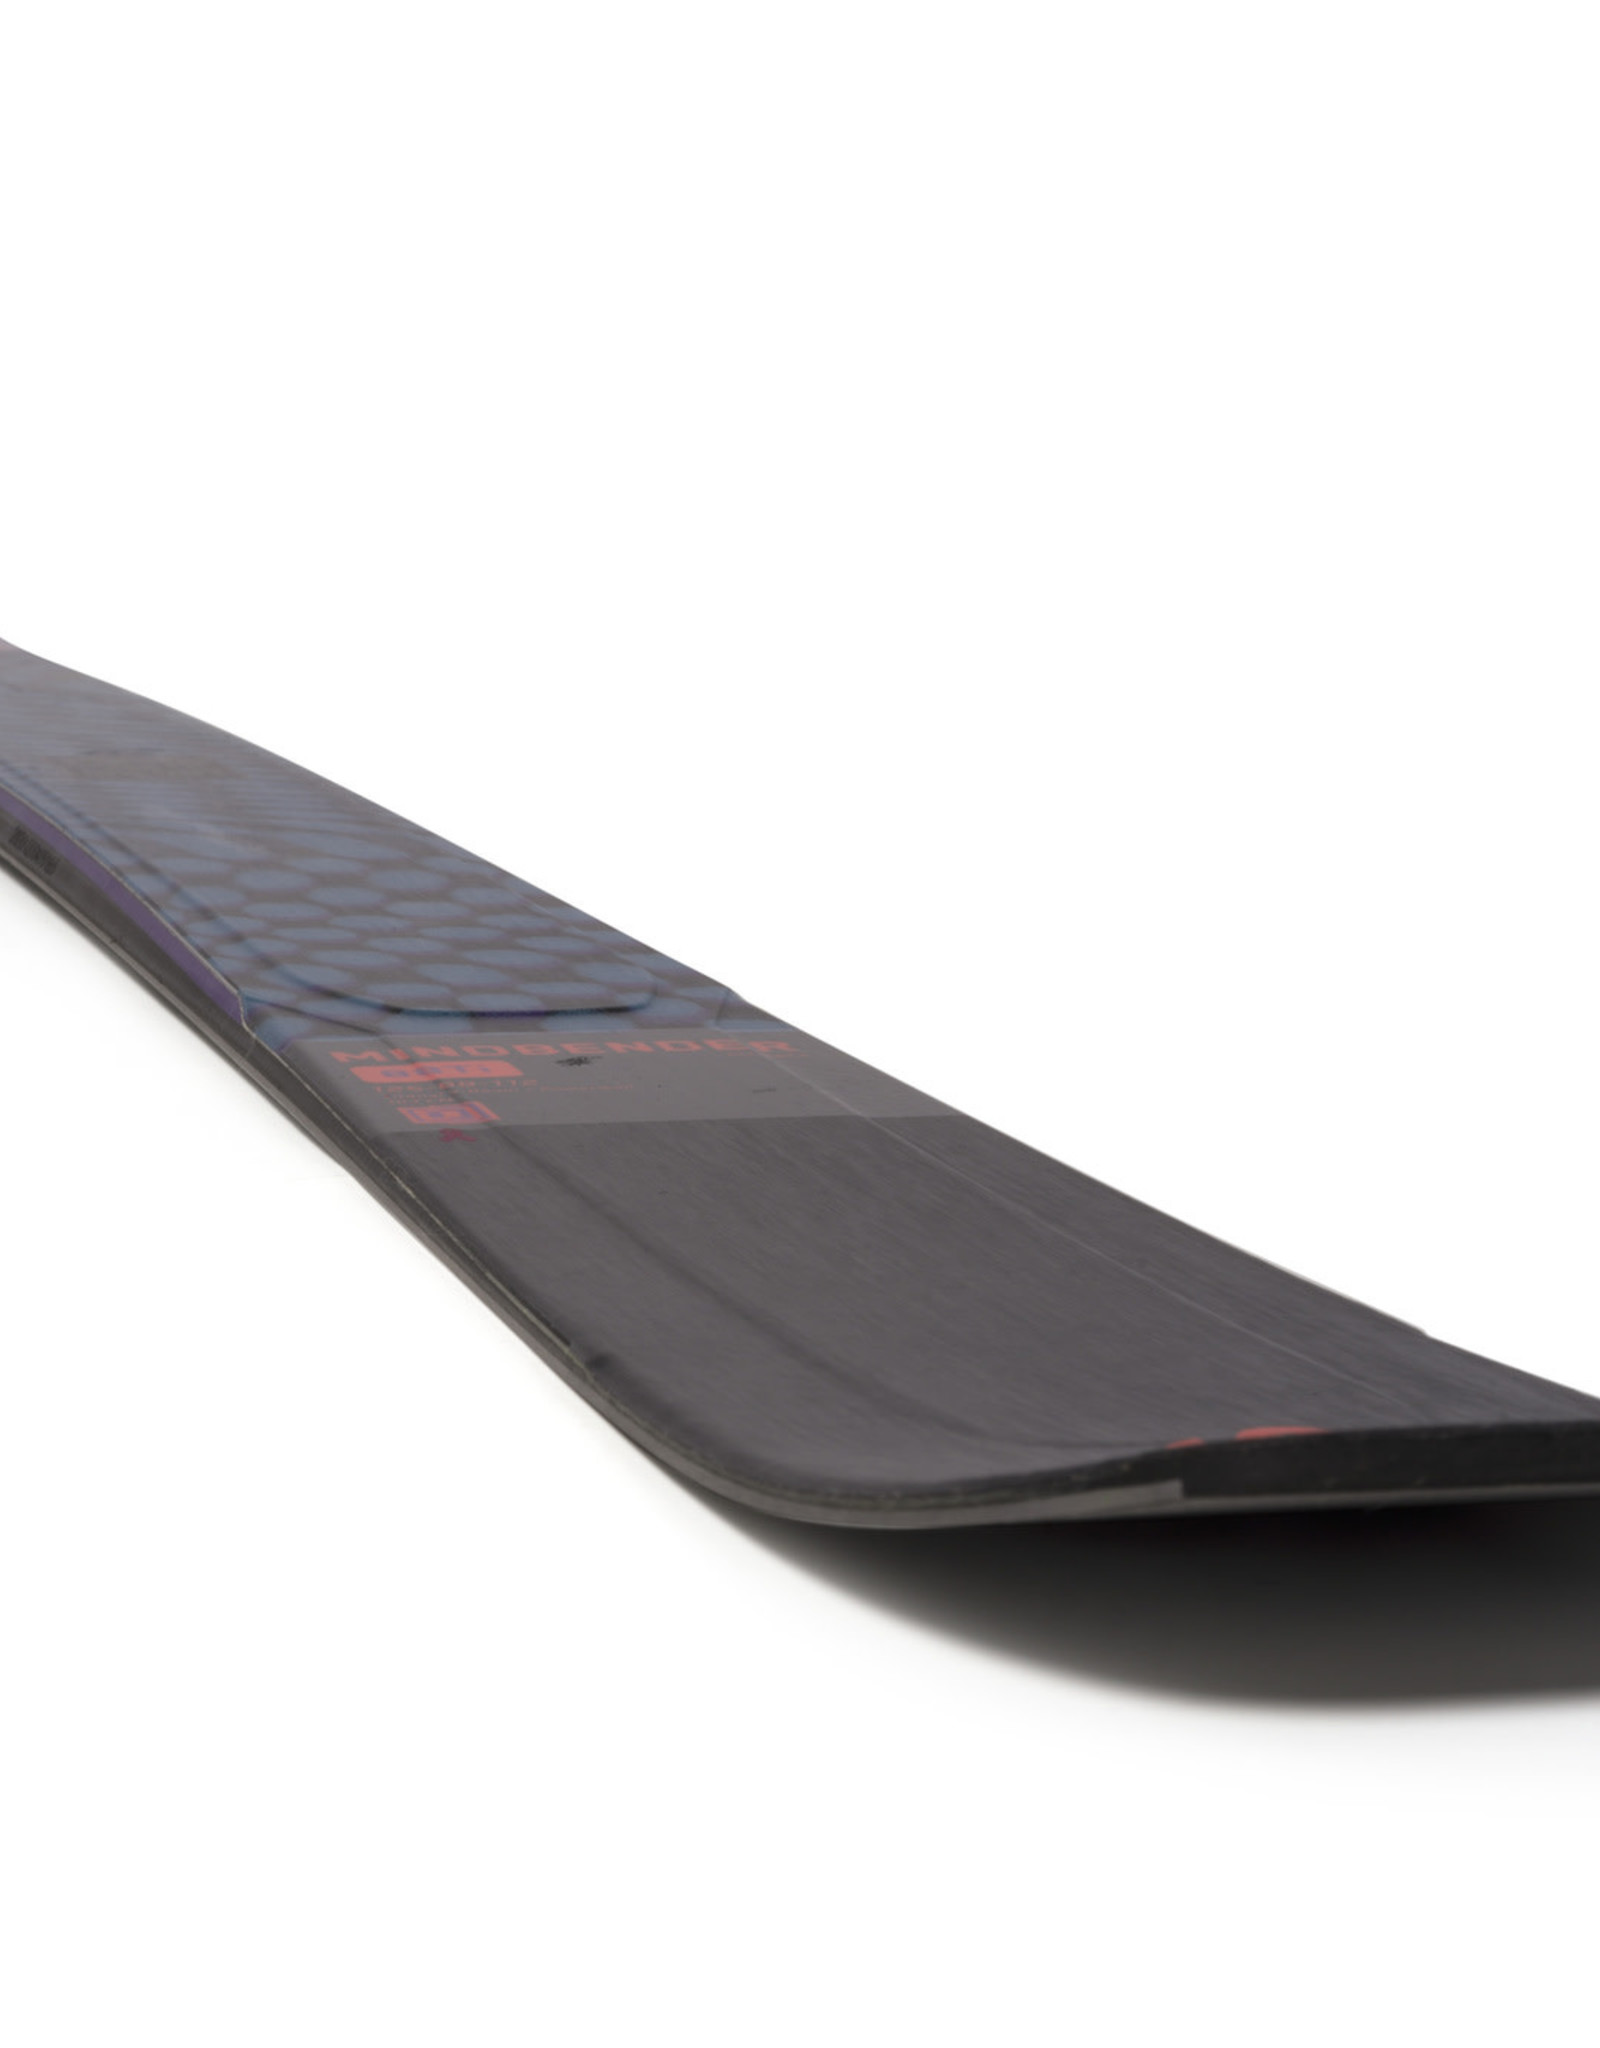 K2 K2 Skis MINDBENDER 88 Ti ALLIANCE (21/22)